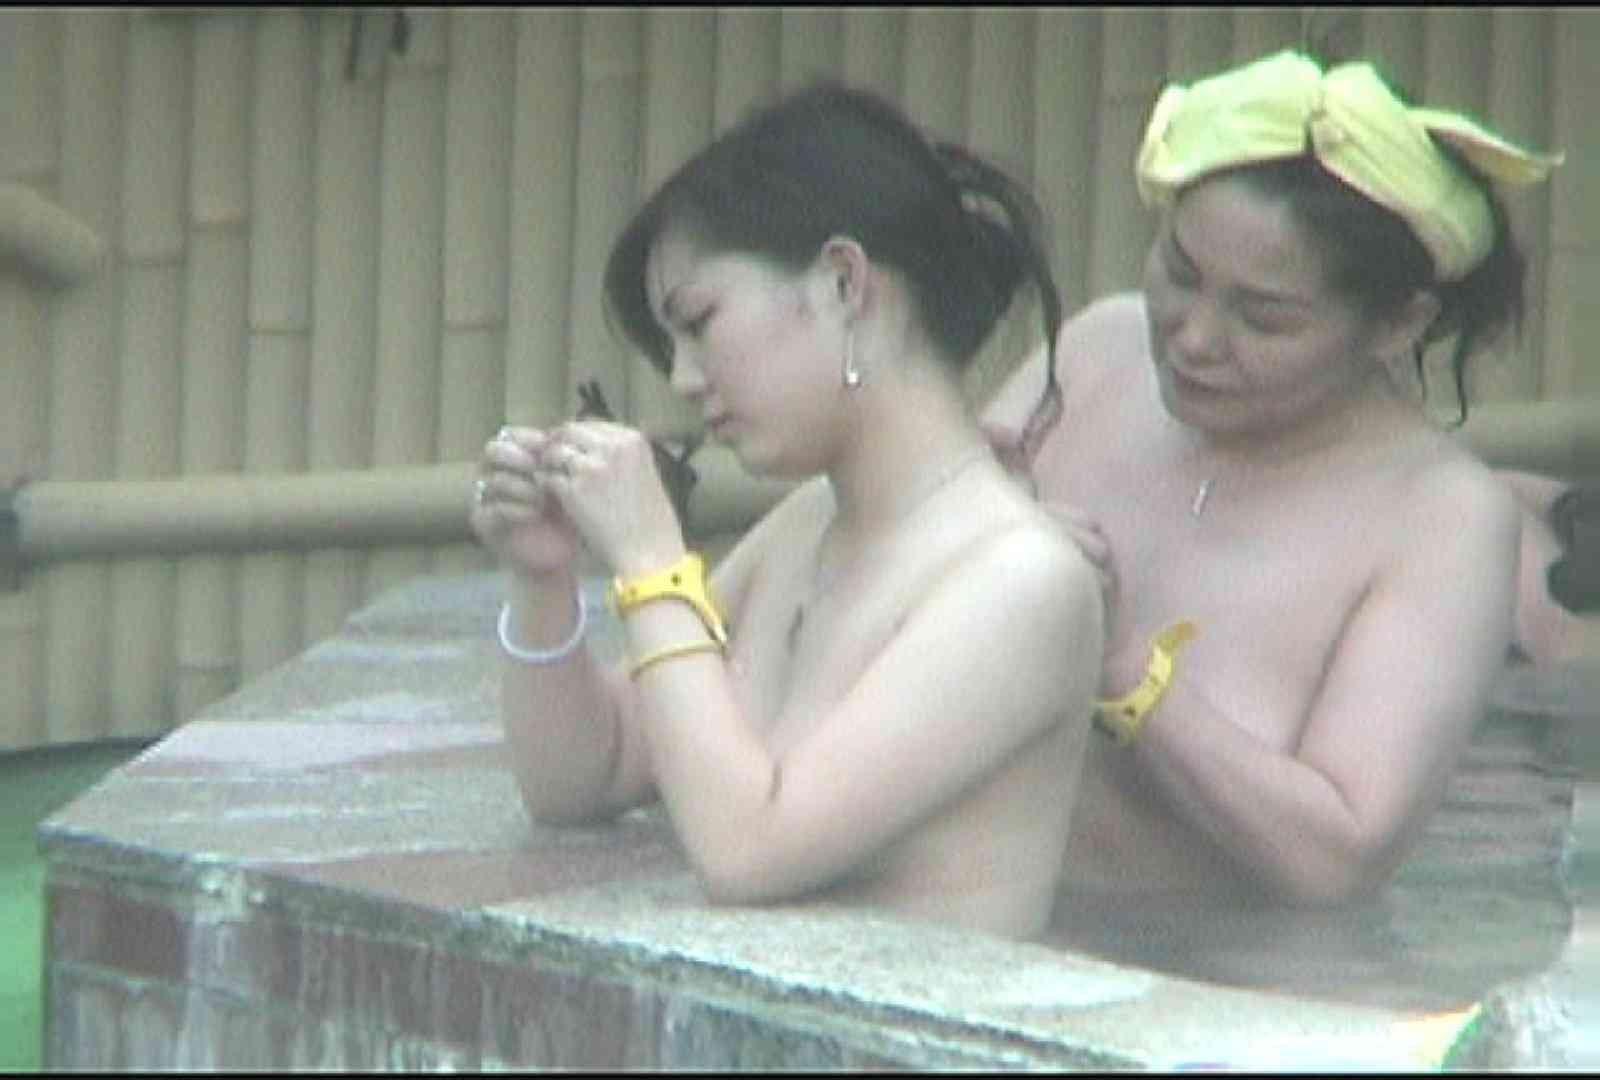 Aquaな露天風呂Vol.145 盗撮 | OLセックス  106画像 70